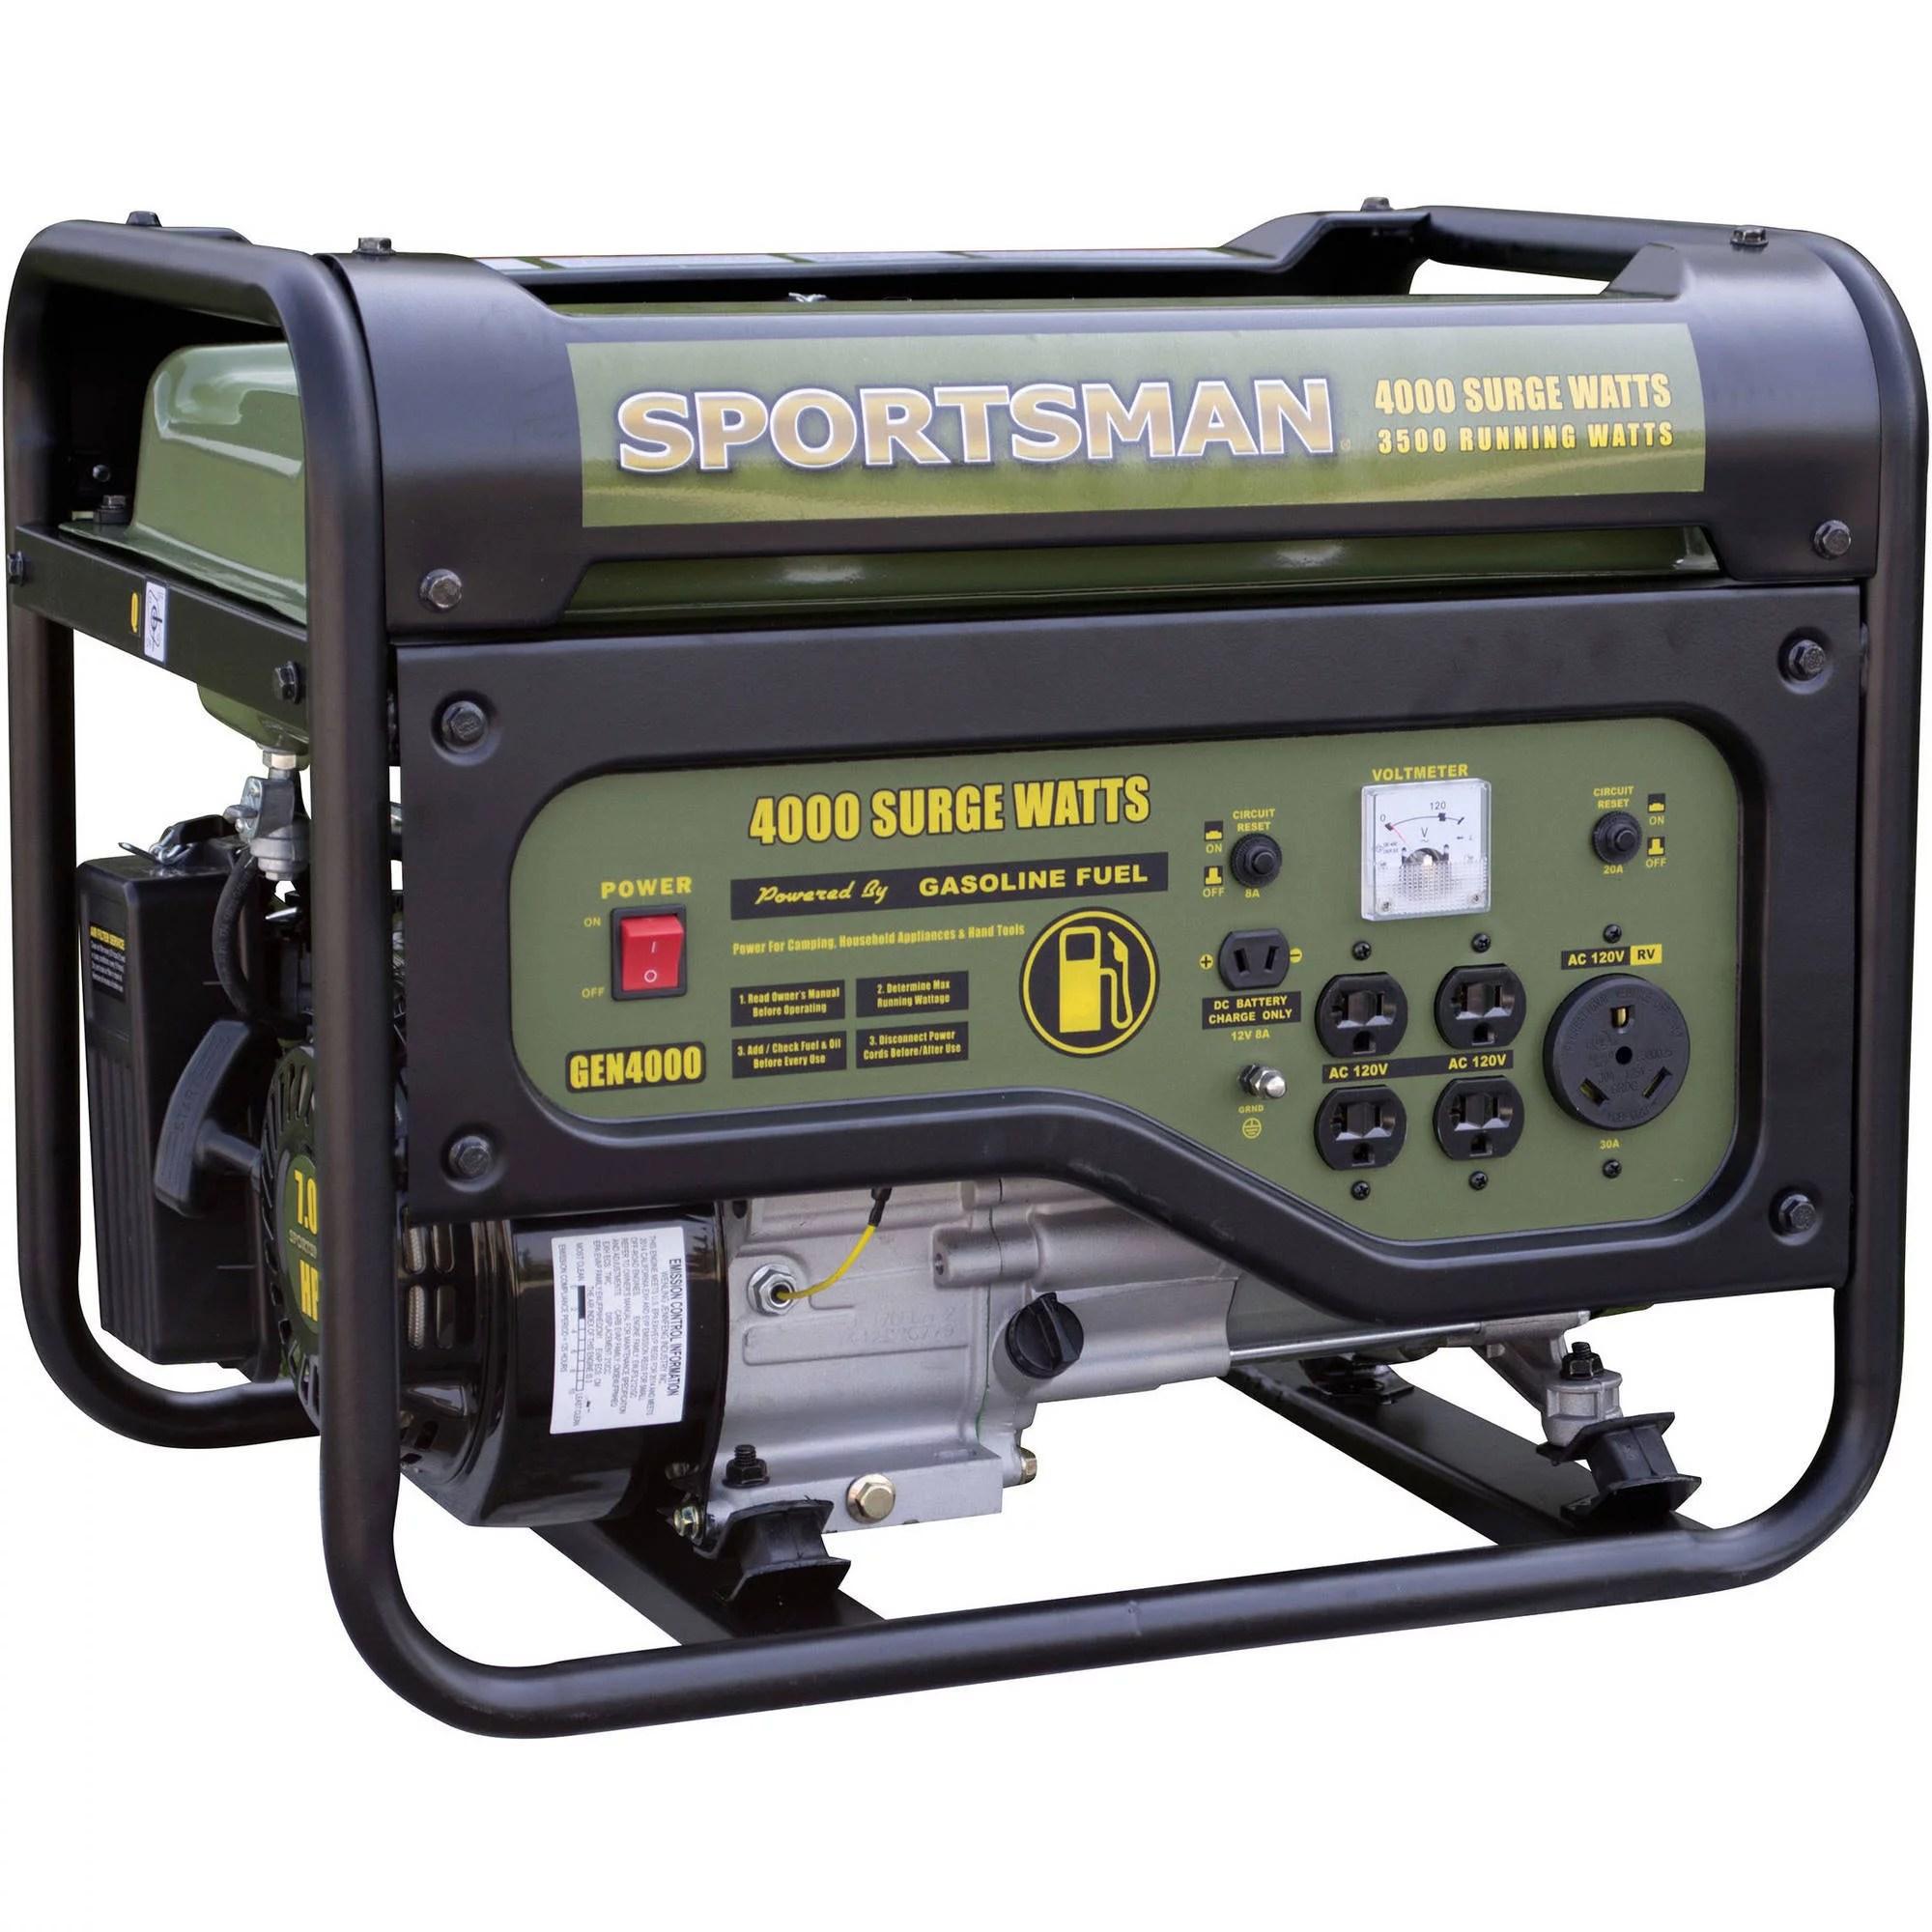 hight resolution of 5802 10000 watt electric start portable generator 49 state walmart com